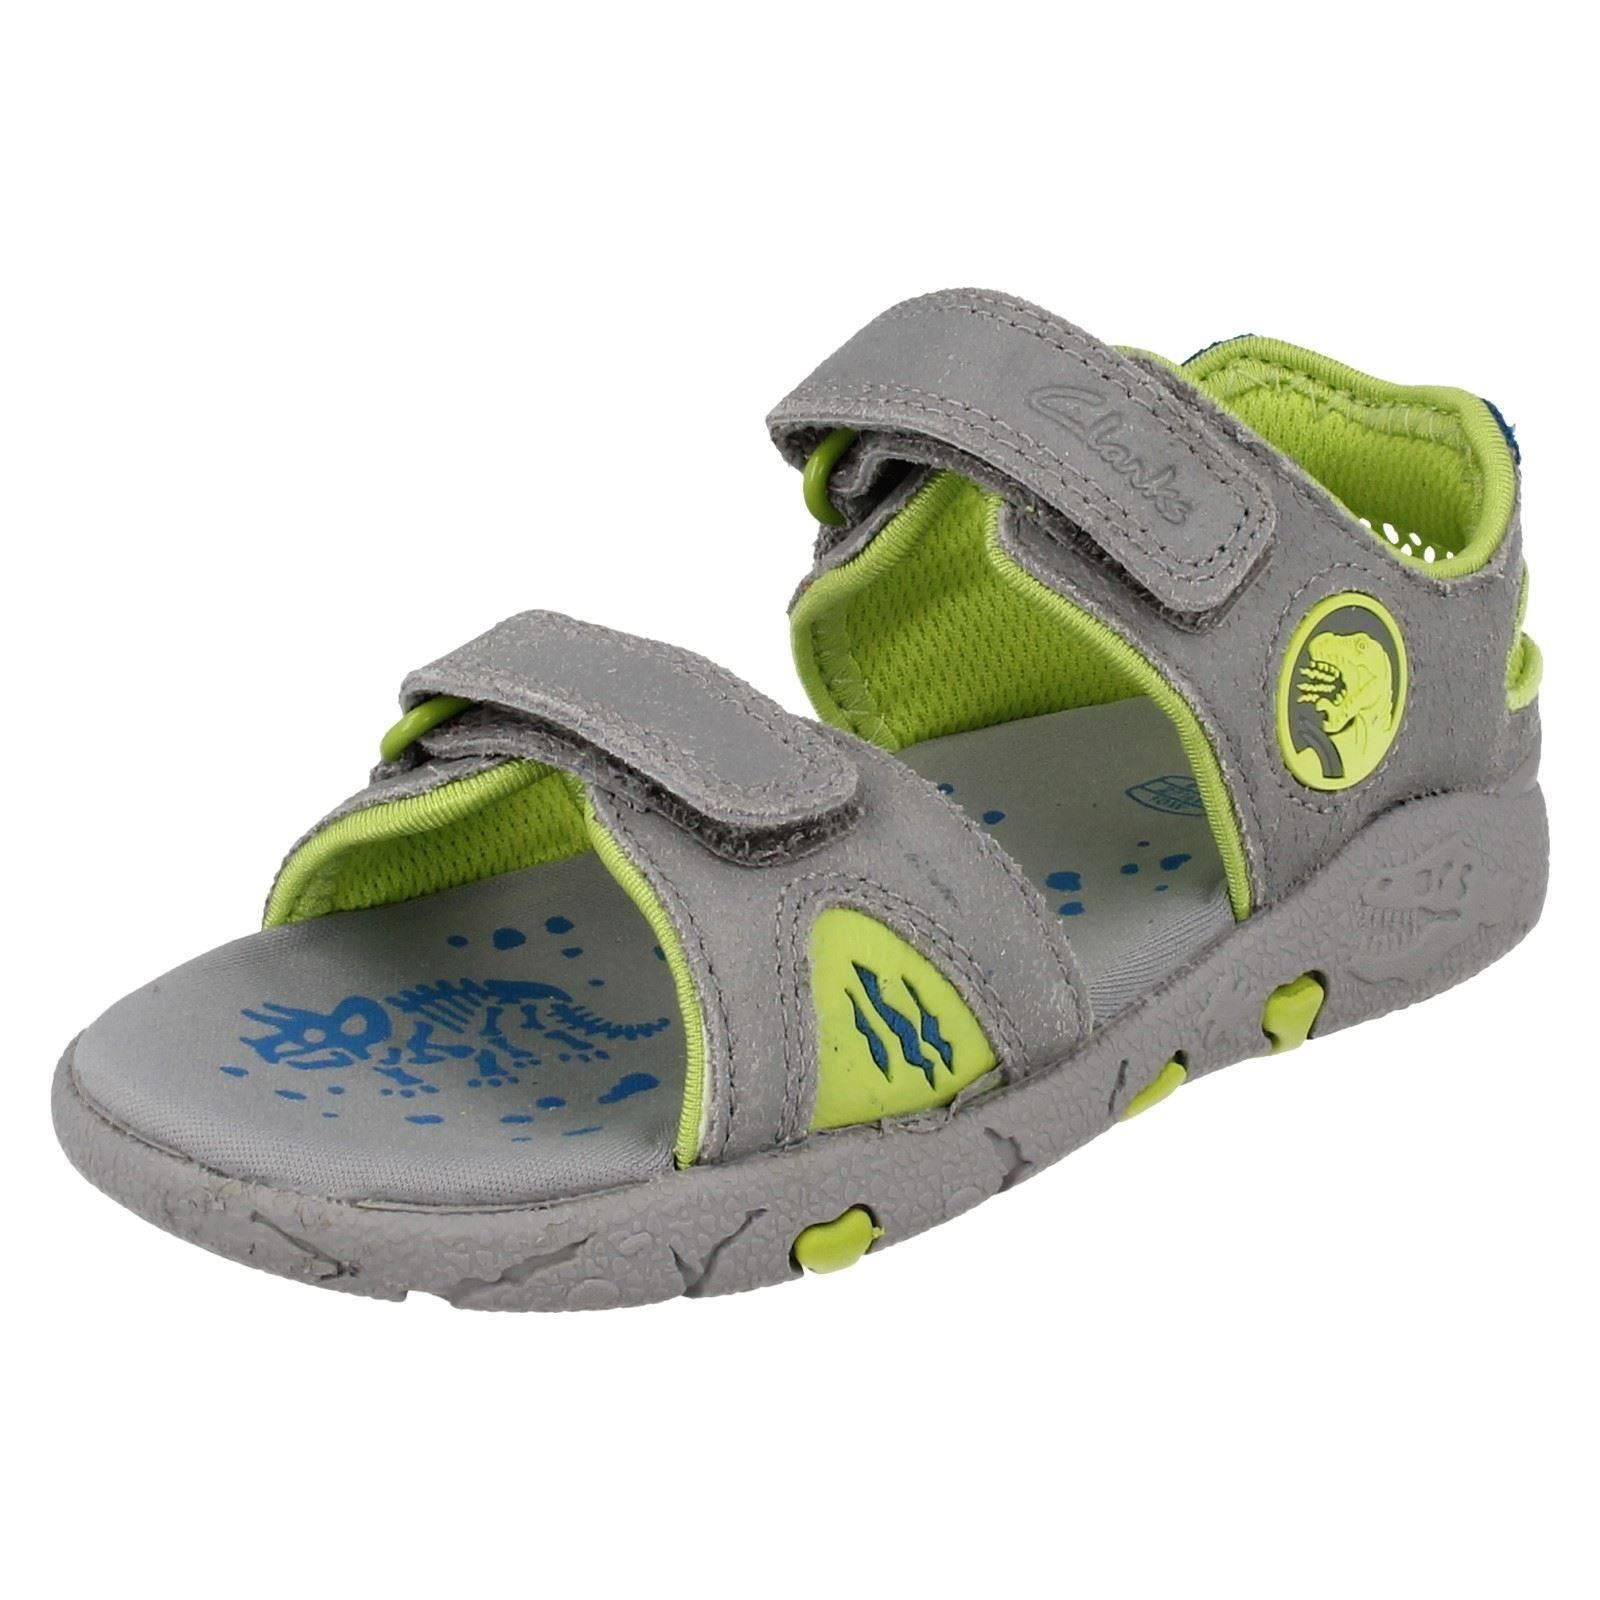 Clarks Boys Summer Sandals Tyrano Walk